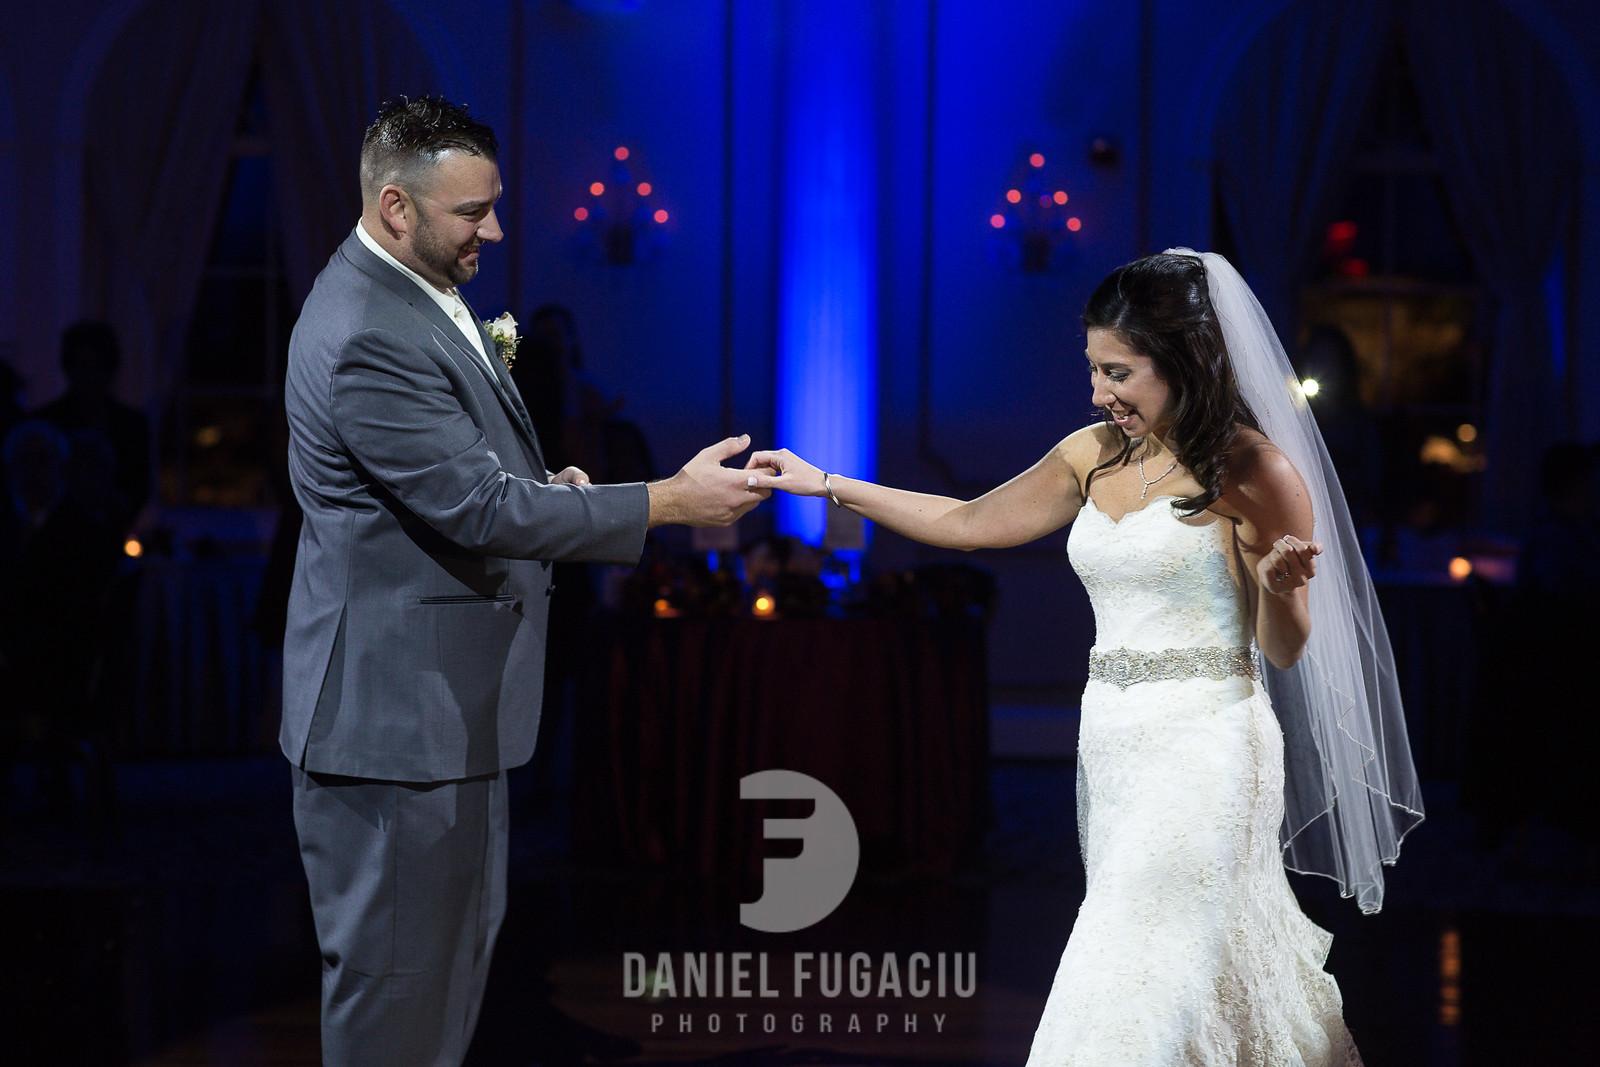 Daniel_Fugaciu_Photography_Liz_Rob_Real_Weddding_April_Lynn_Designs_The_Merion_New_Jersey_Brugundy_Gold_Wedding38